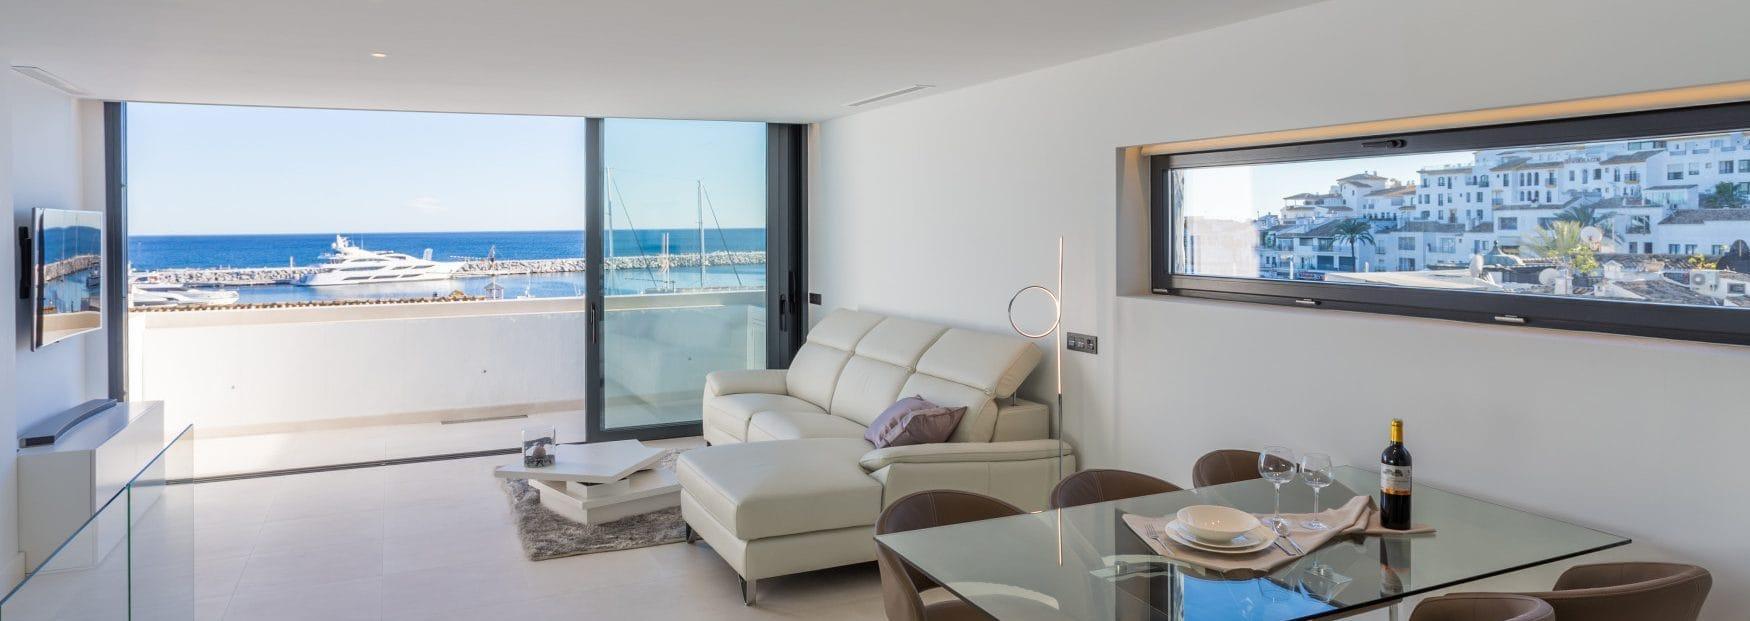 Duplex Penthouse - Puerto Banus, Marbella